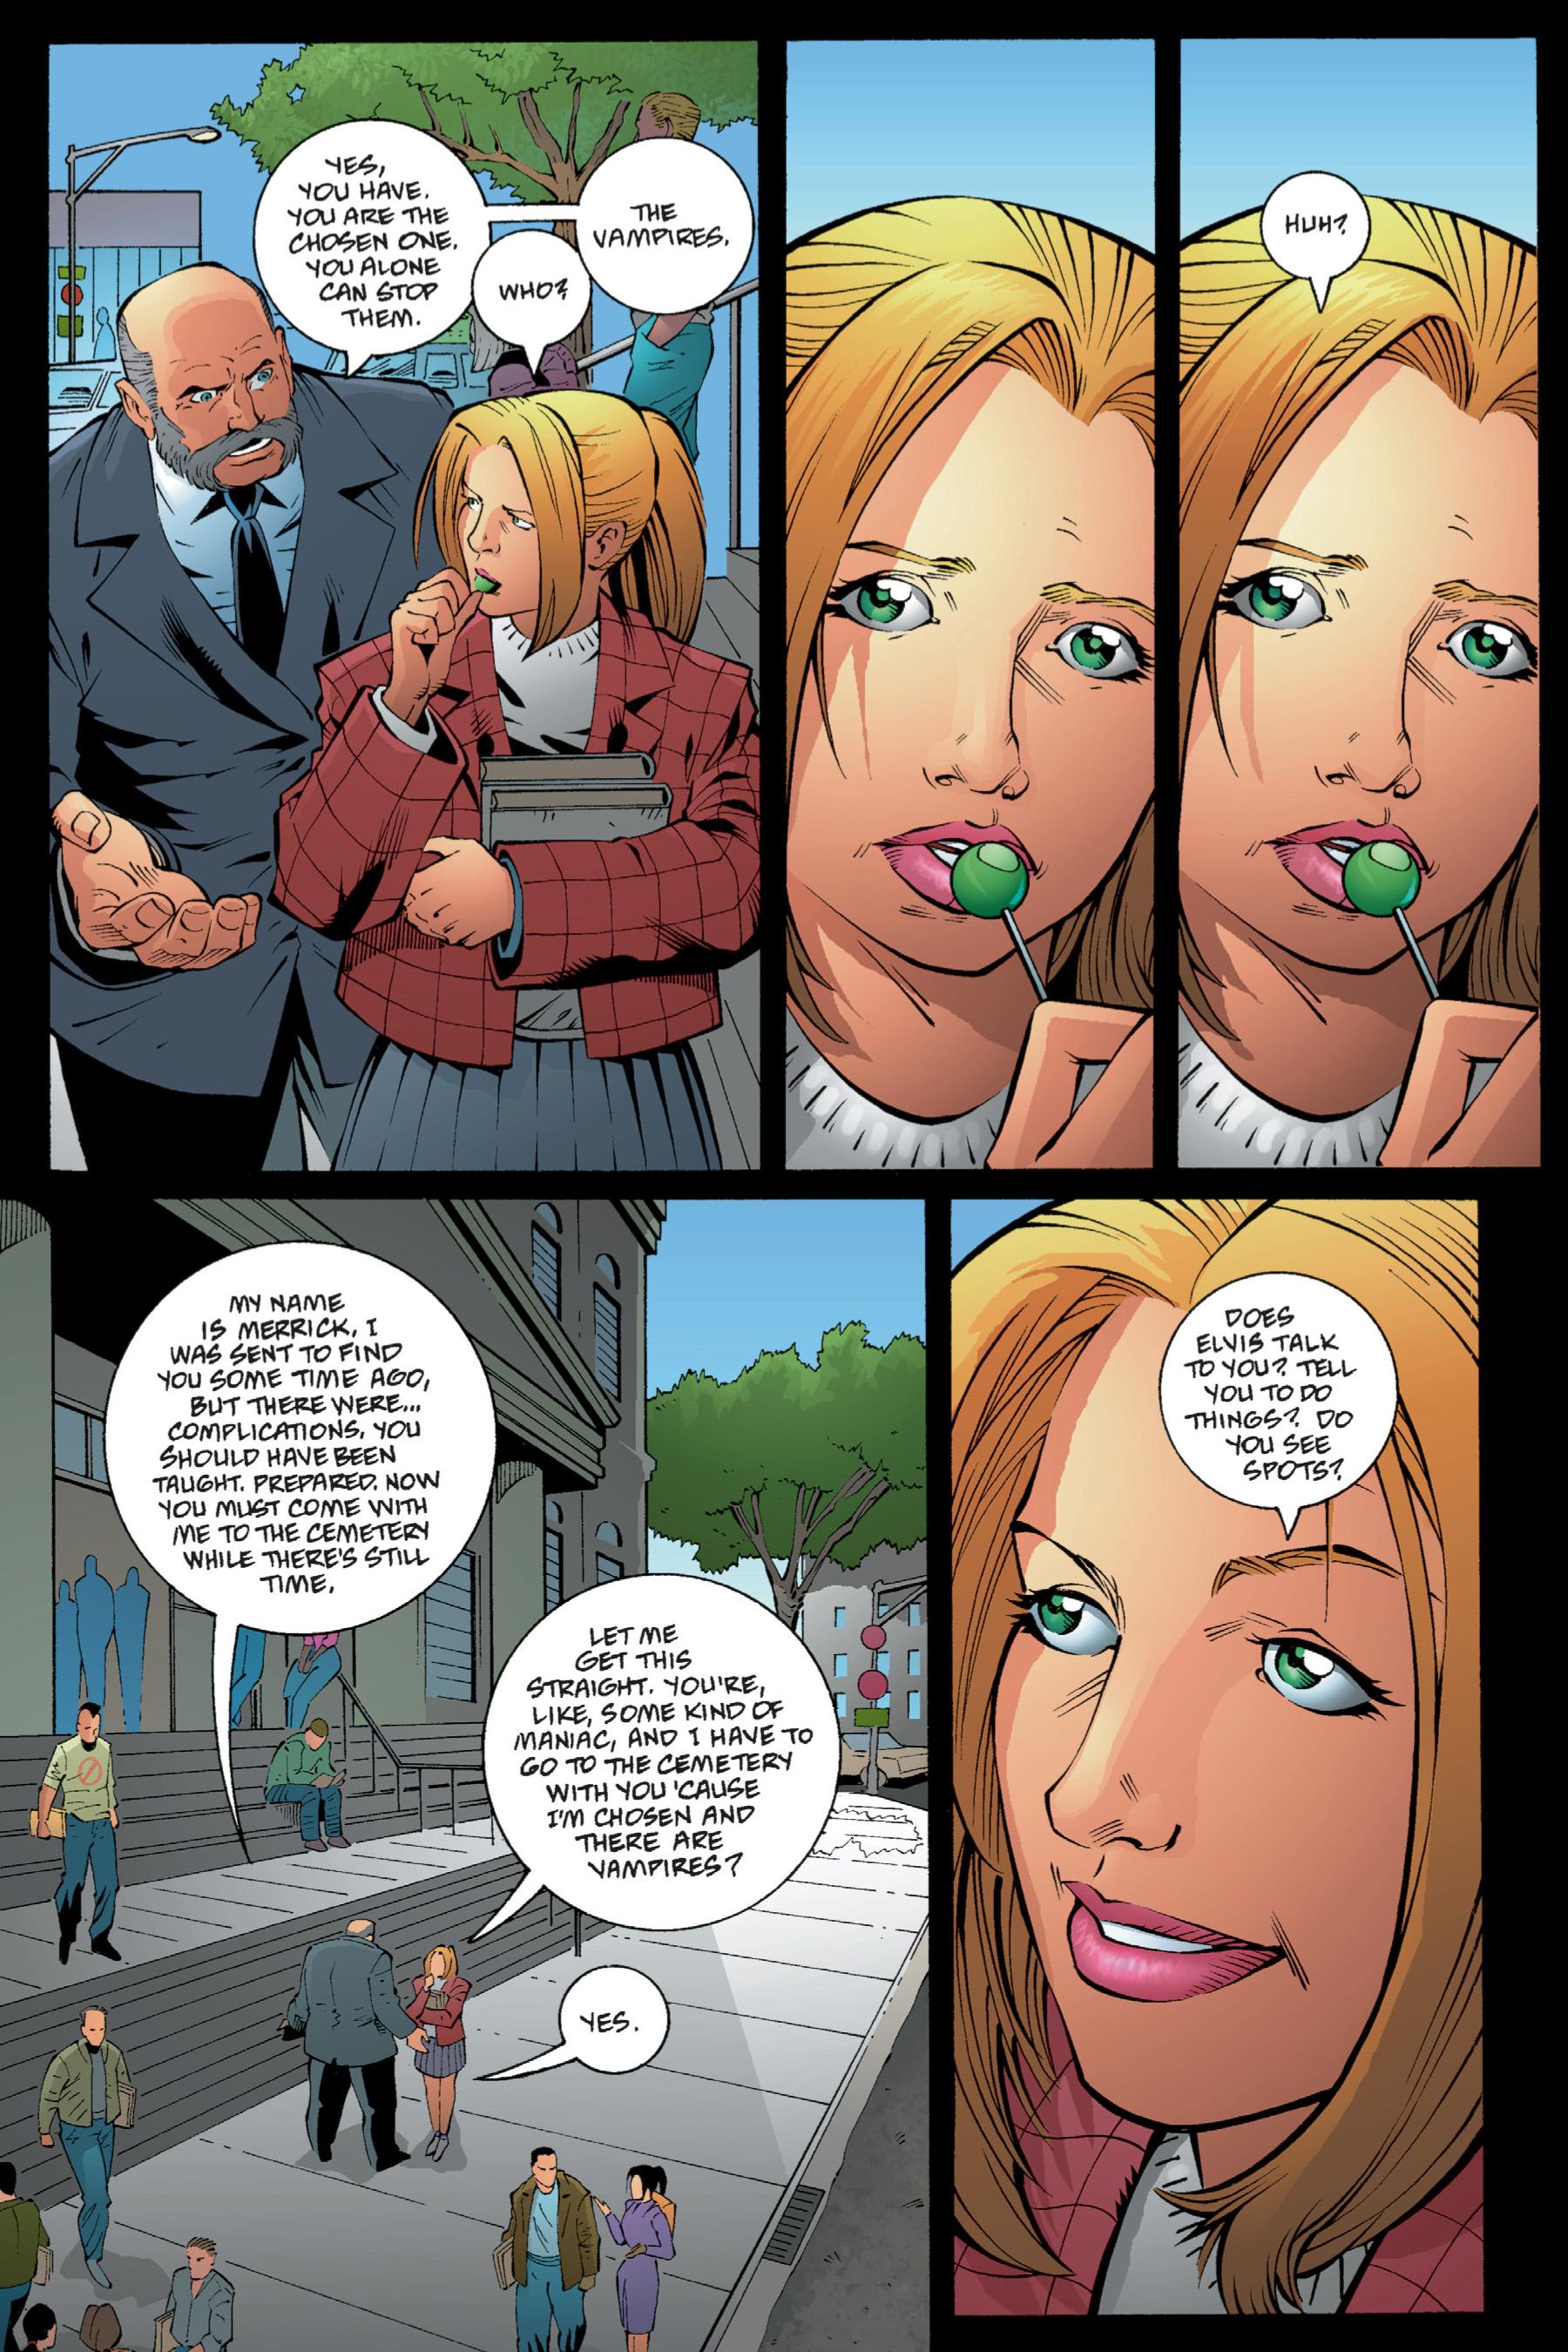 Read online Buffy the Vampire Slayer: Omnibus comic -  Issue # TPB 1 - 52